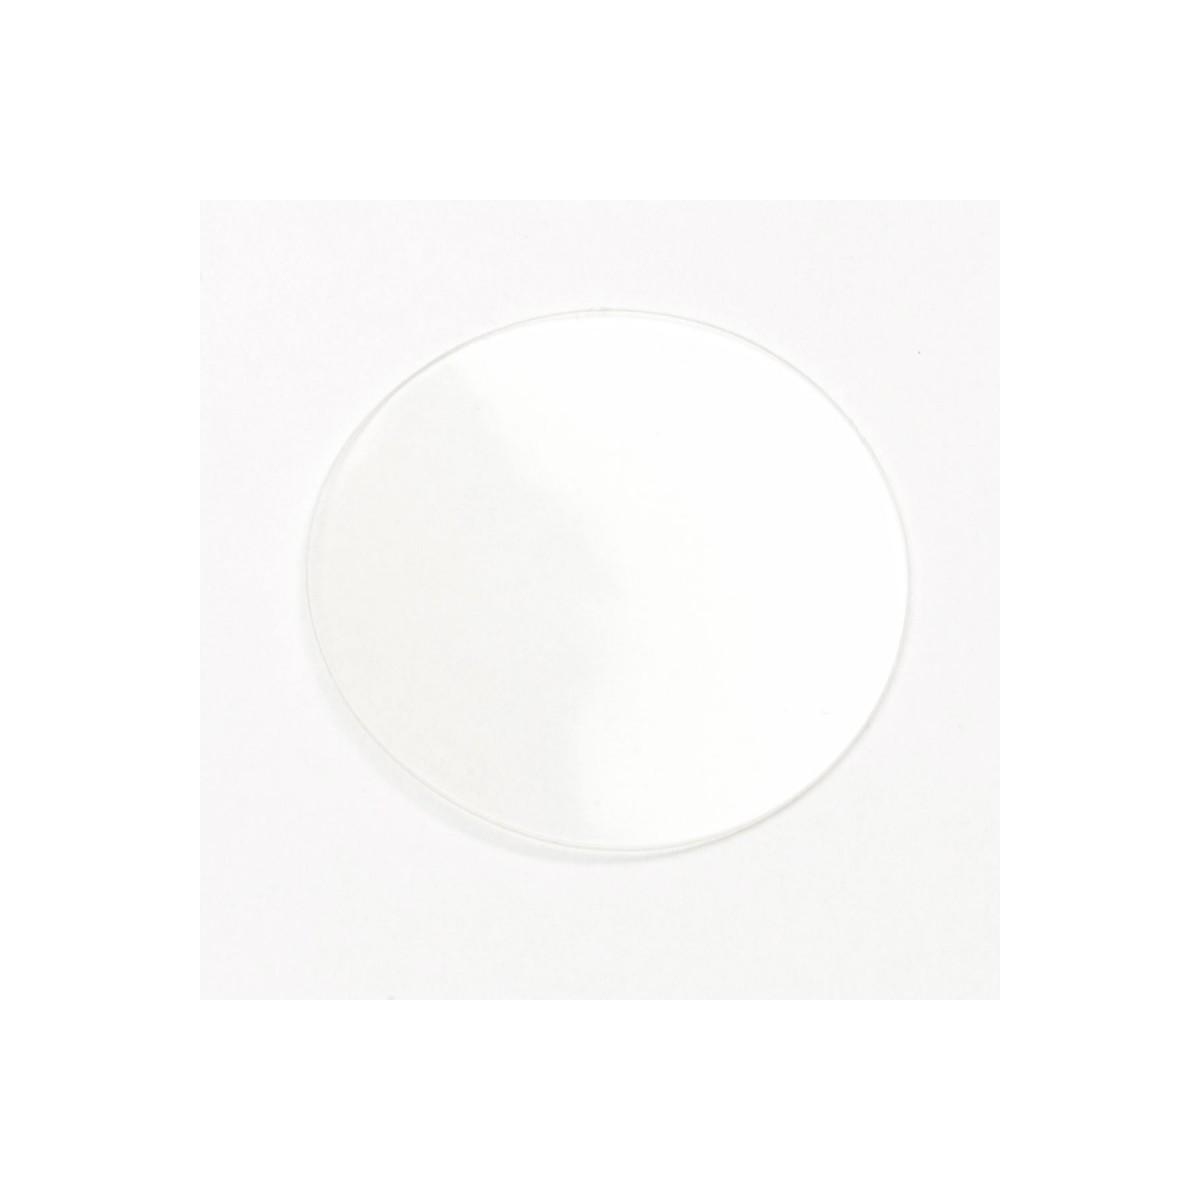 Oceanic Lens Cover Atom 3 b u d